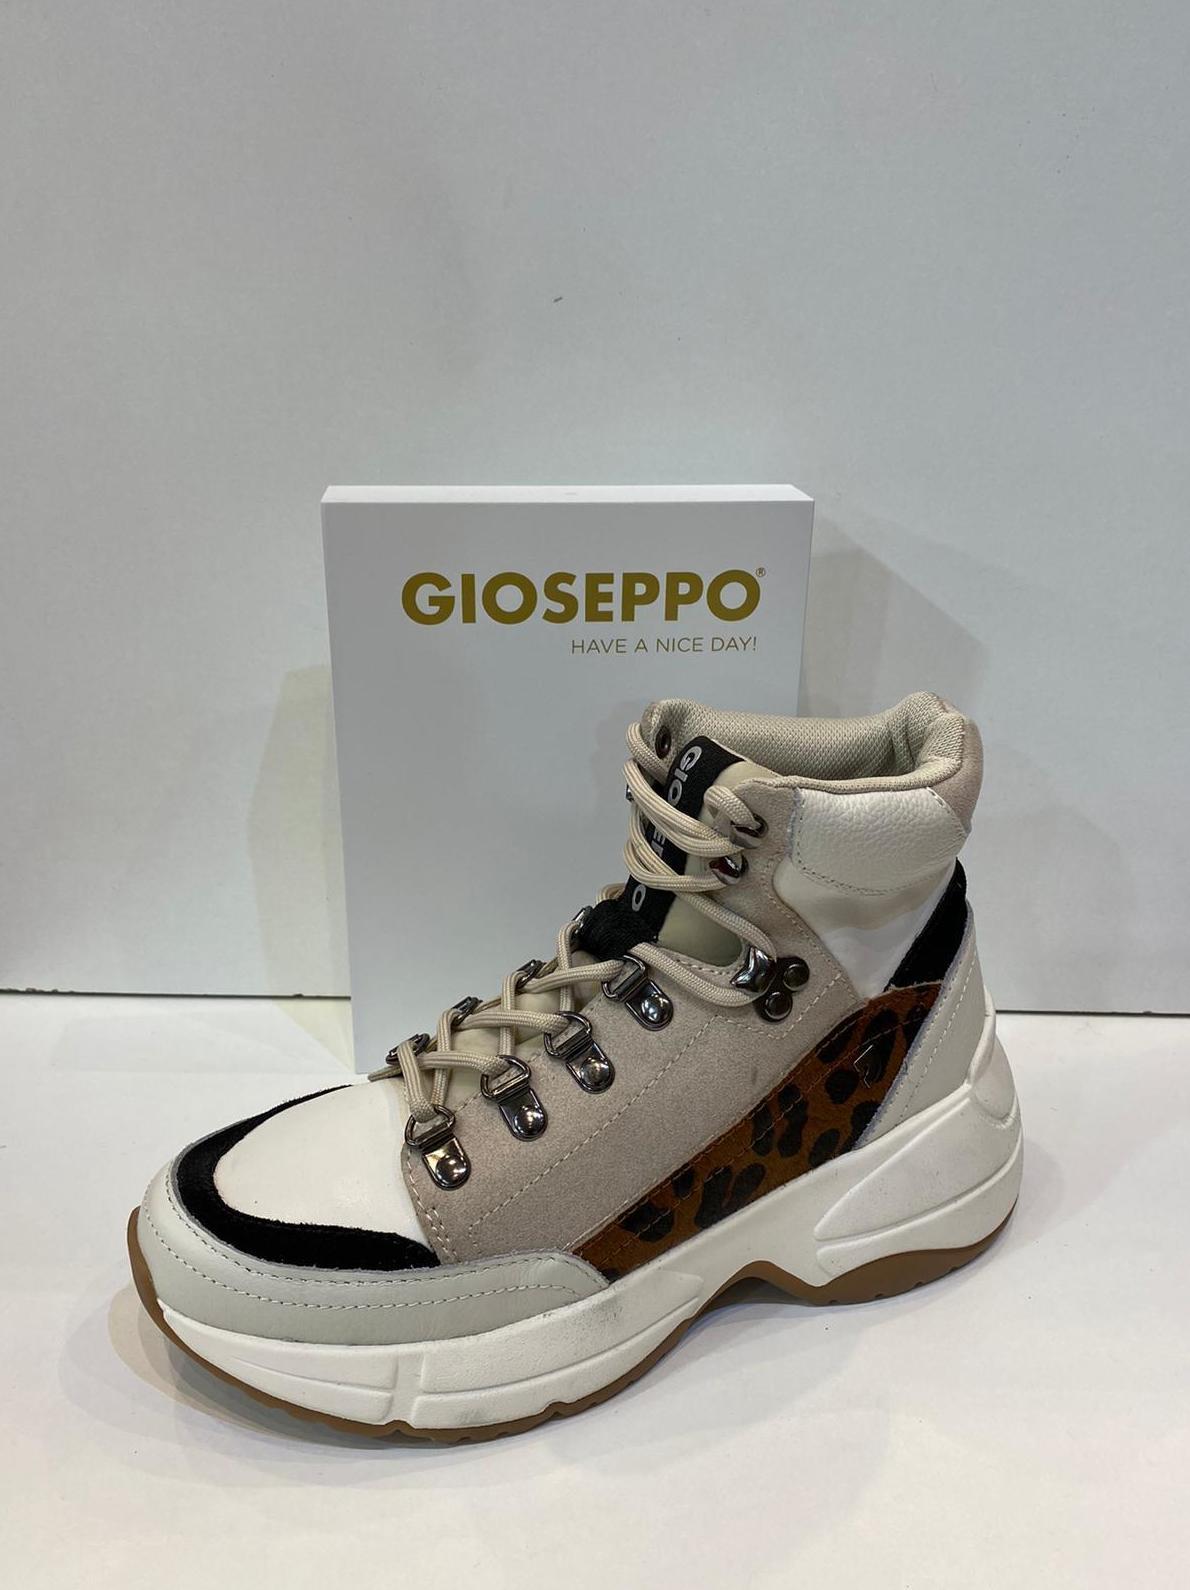 Botí de dona, de la marca Gioseppo 84.95€